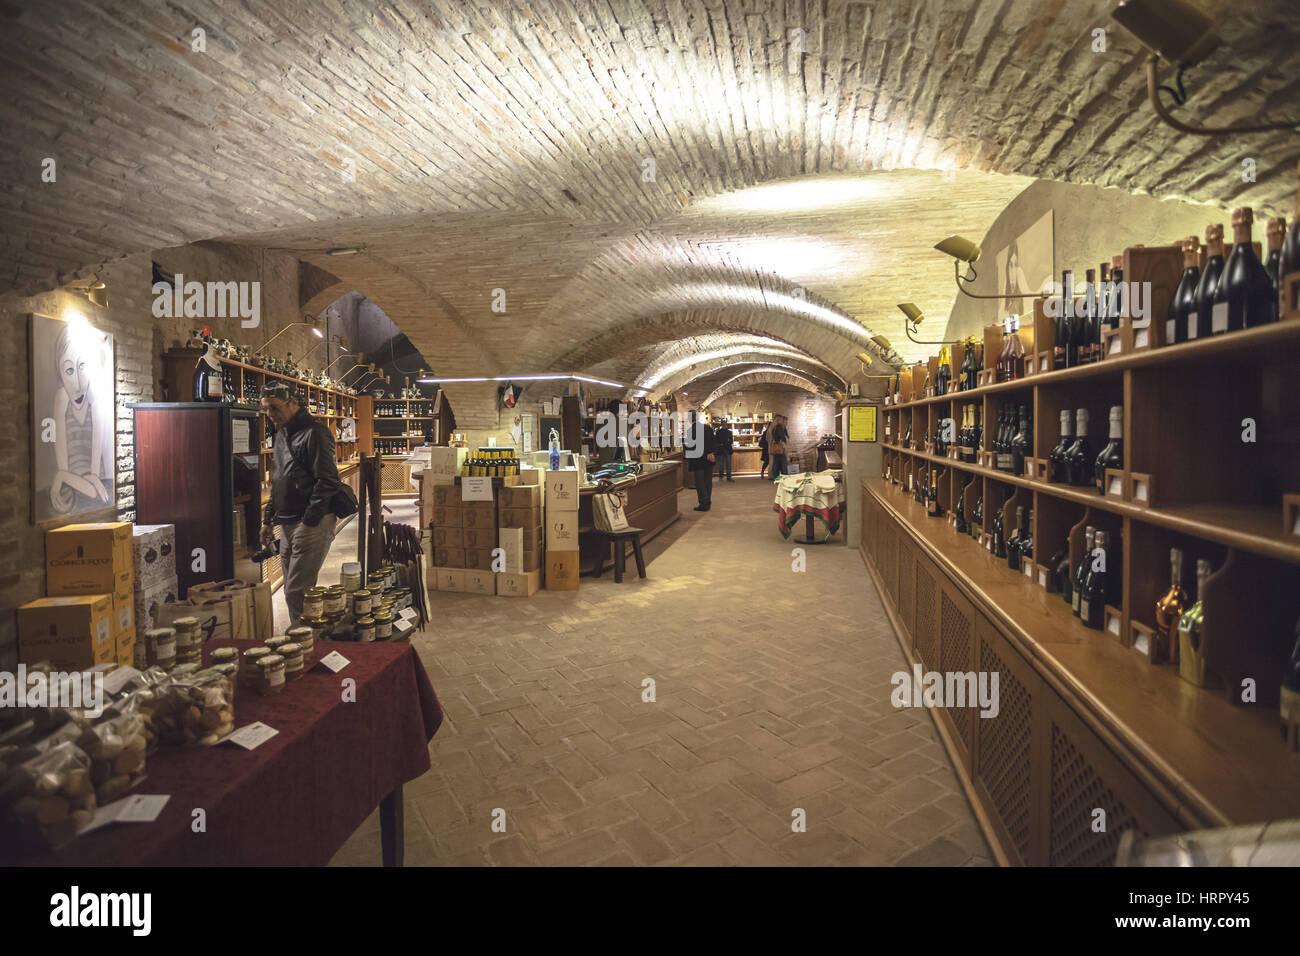 Italy Wine Bar Stockfotos & Italy Wine Bar Bilder - Alamy